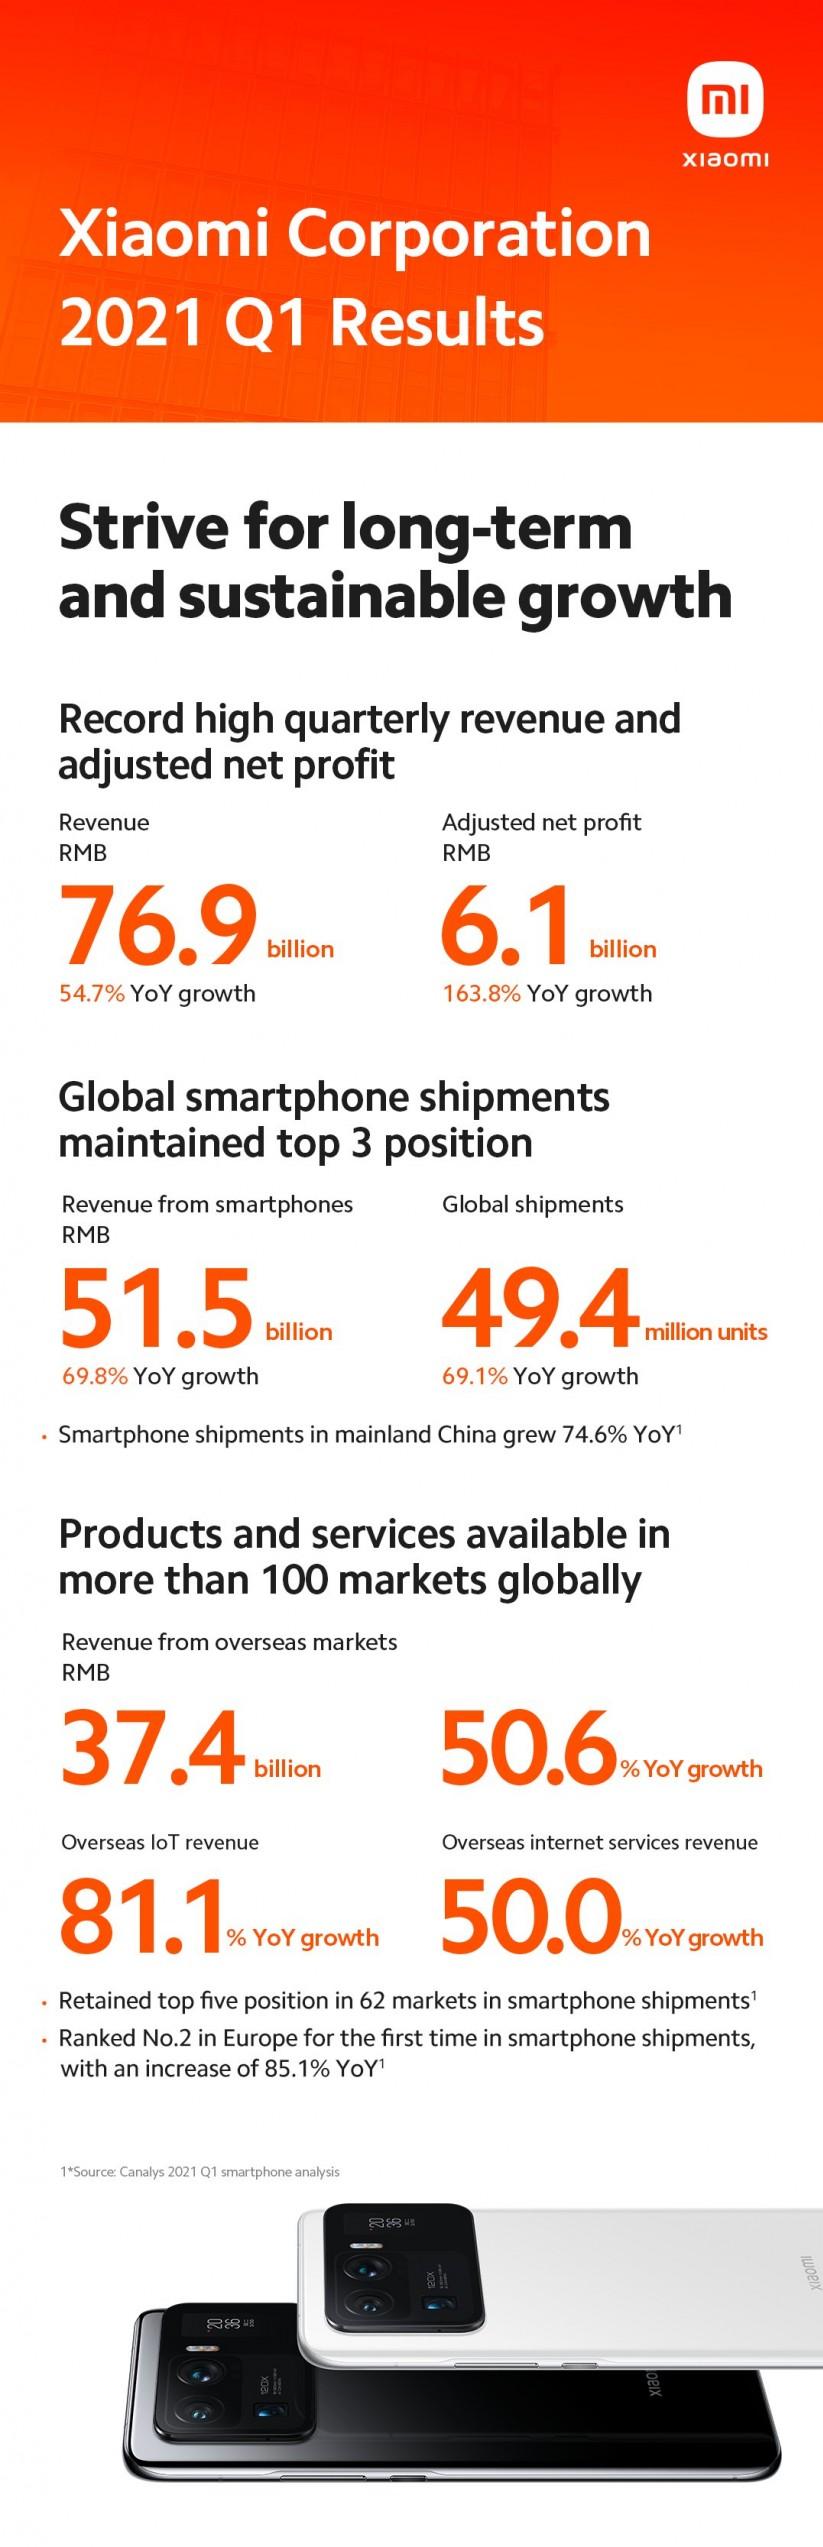 Xiaomi Doubled its Net Profit in Q1 2021